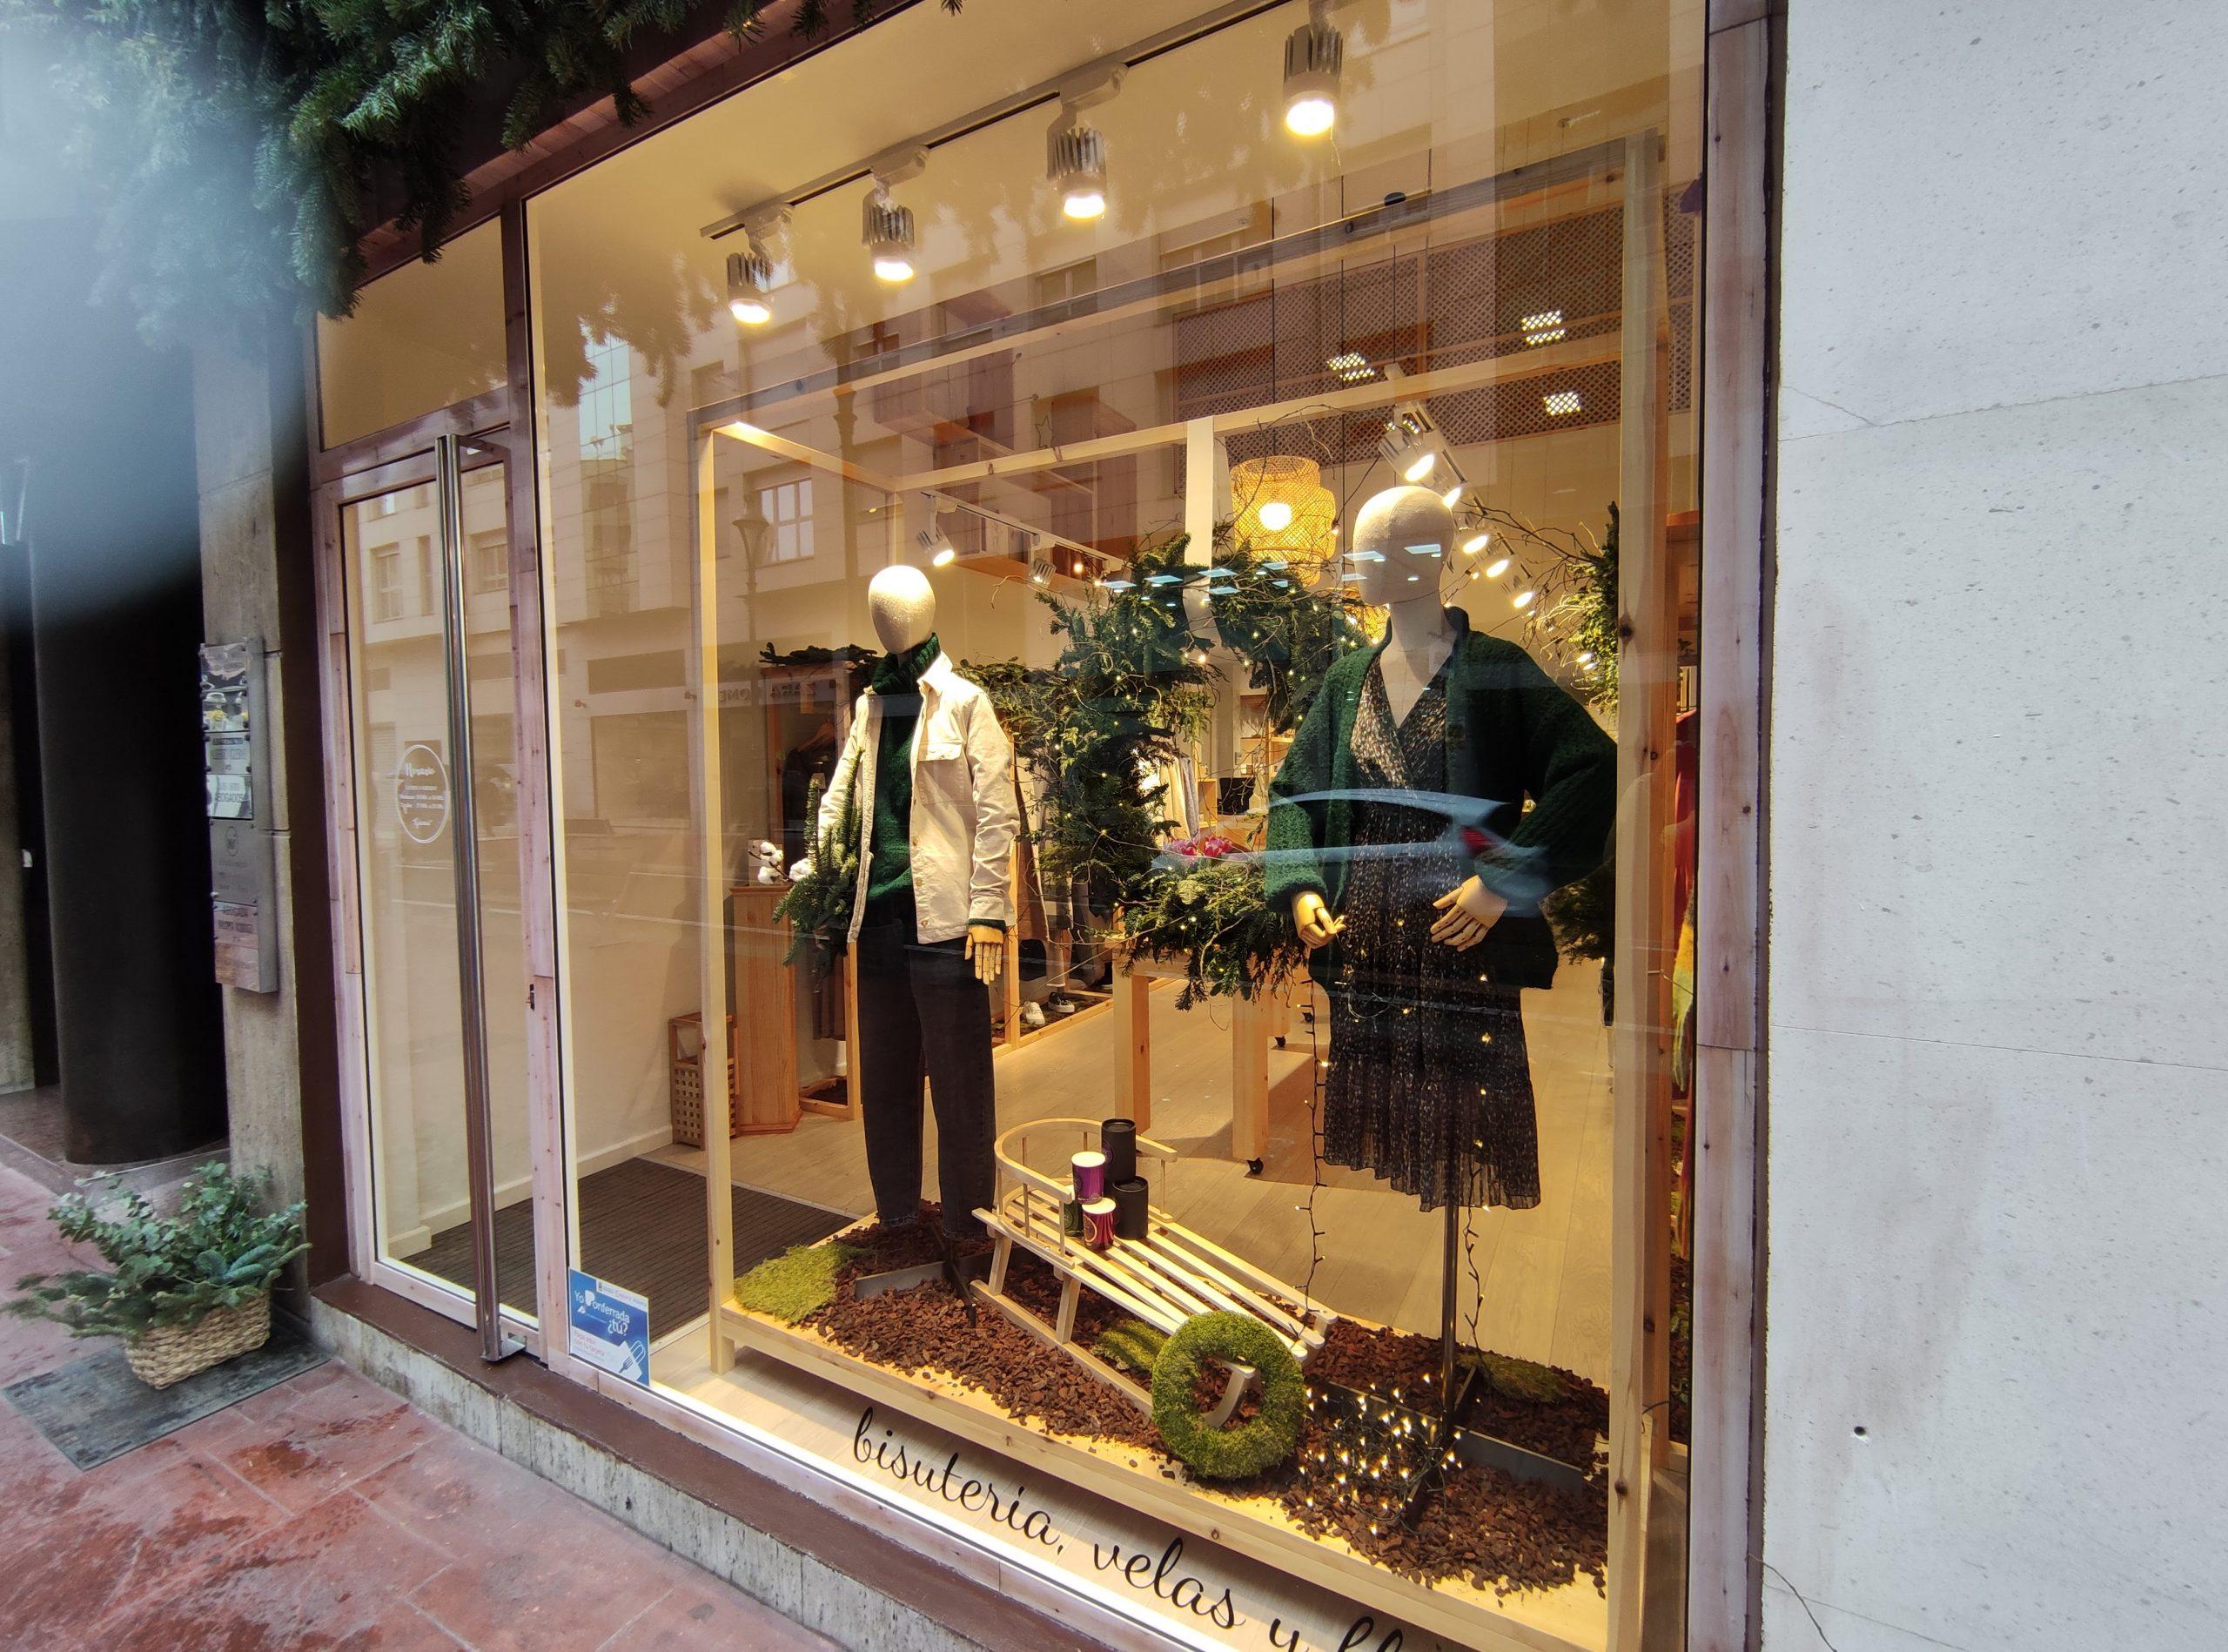 La Favorita Concept Store organiza su primer Christmas Market este domingo 2